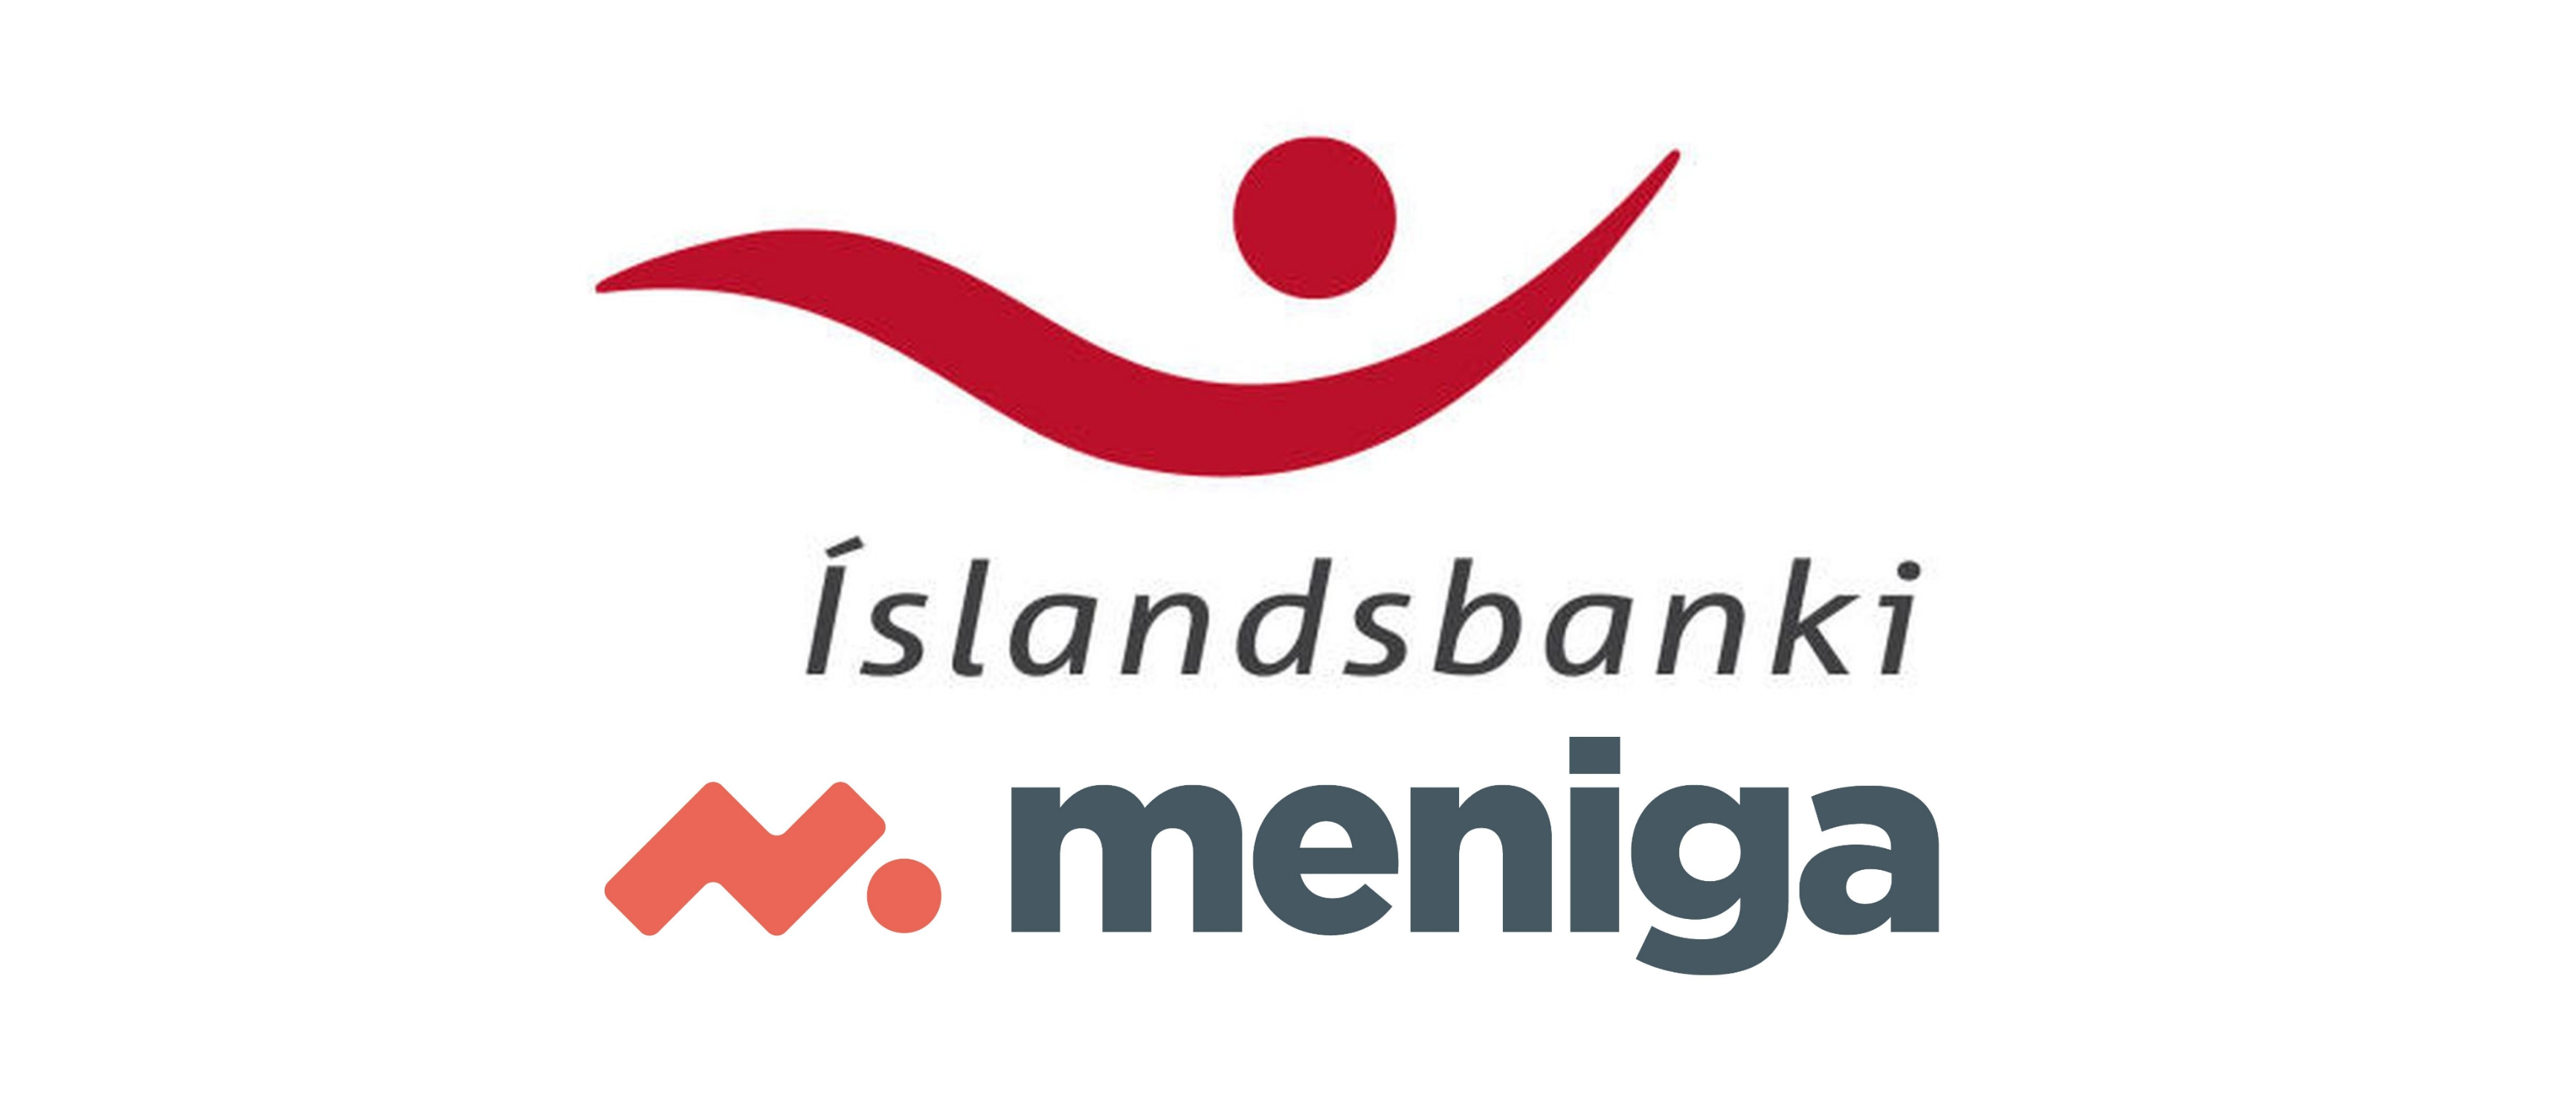 Íslandsbanki launches Meniga's 'Carbon Insight' Service to Help Customers Fight Climate Change